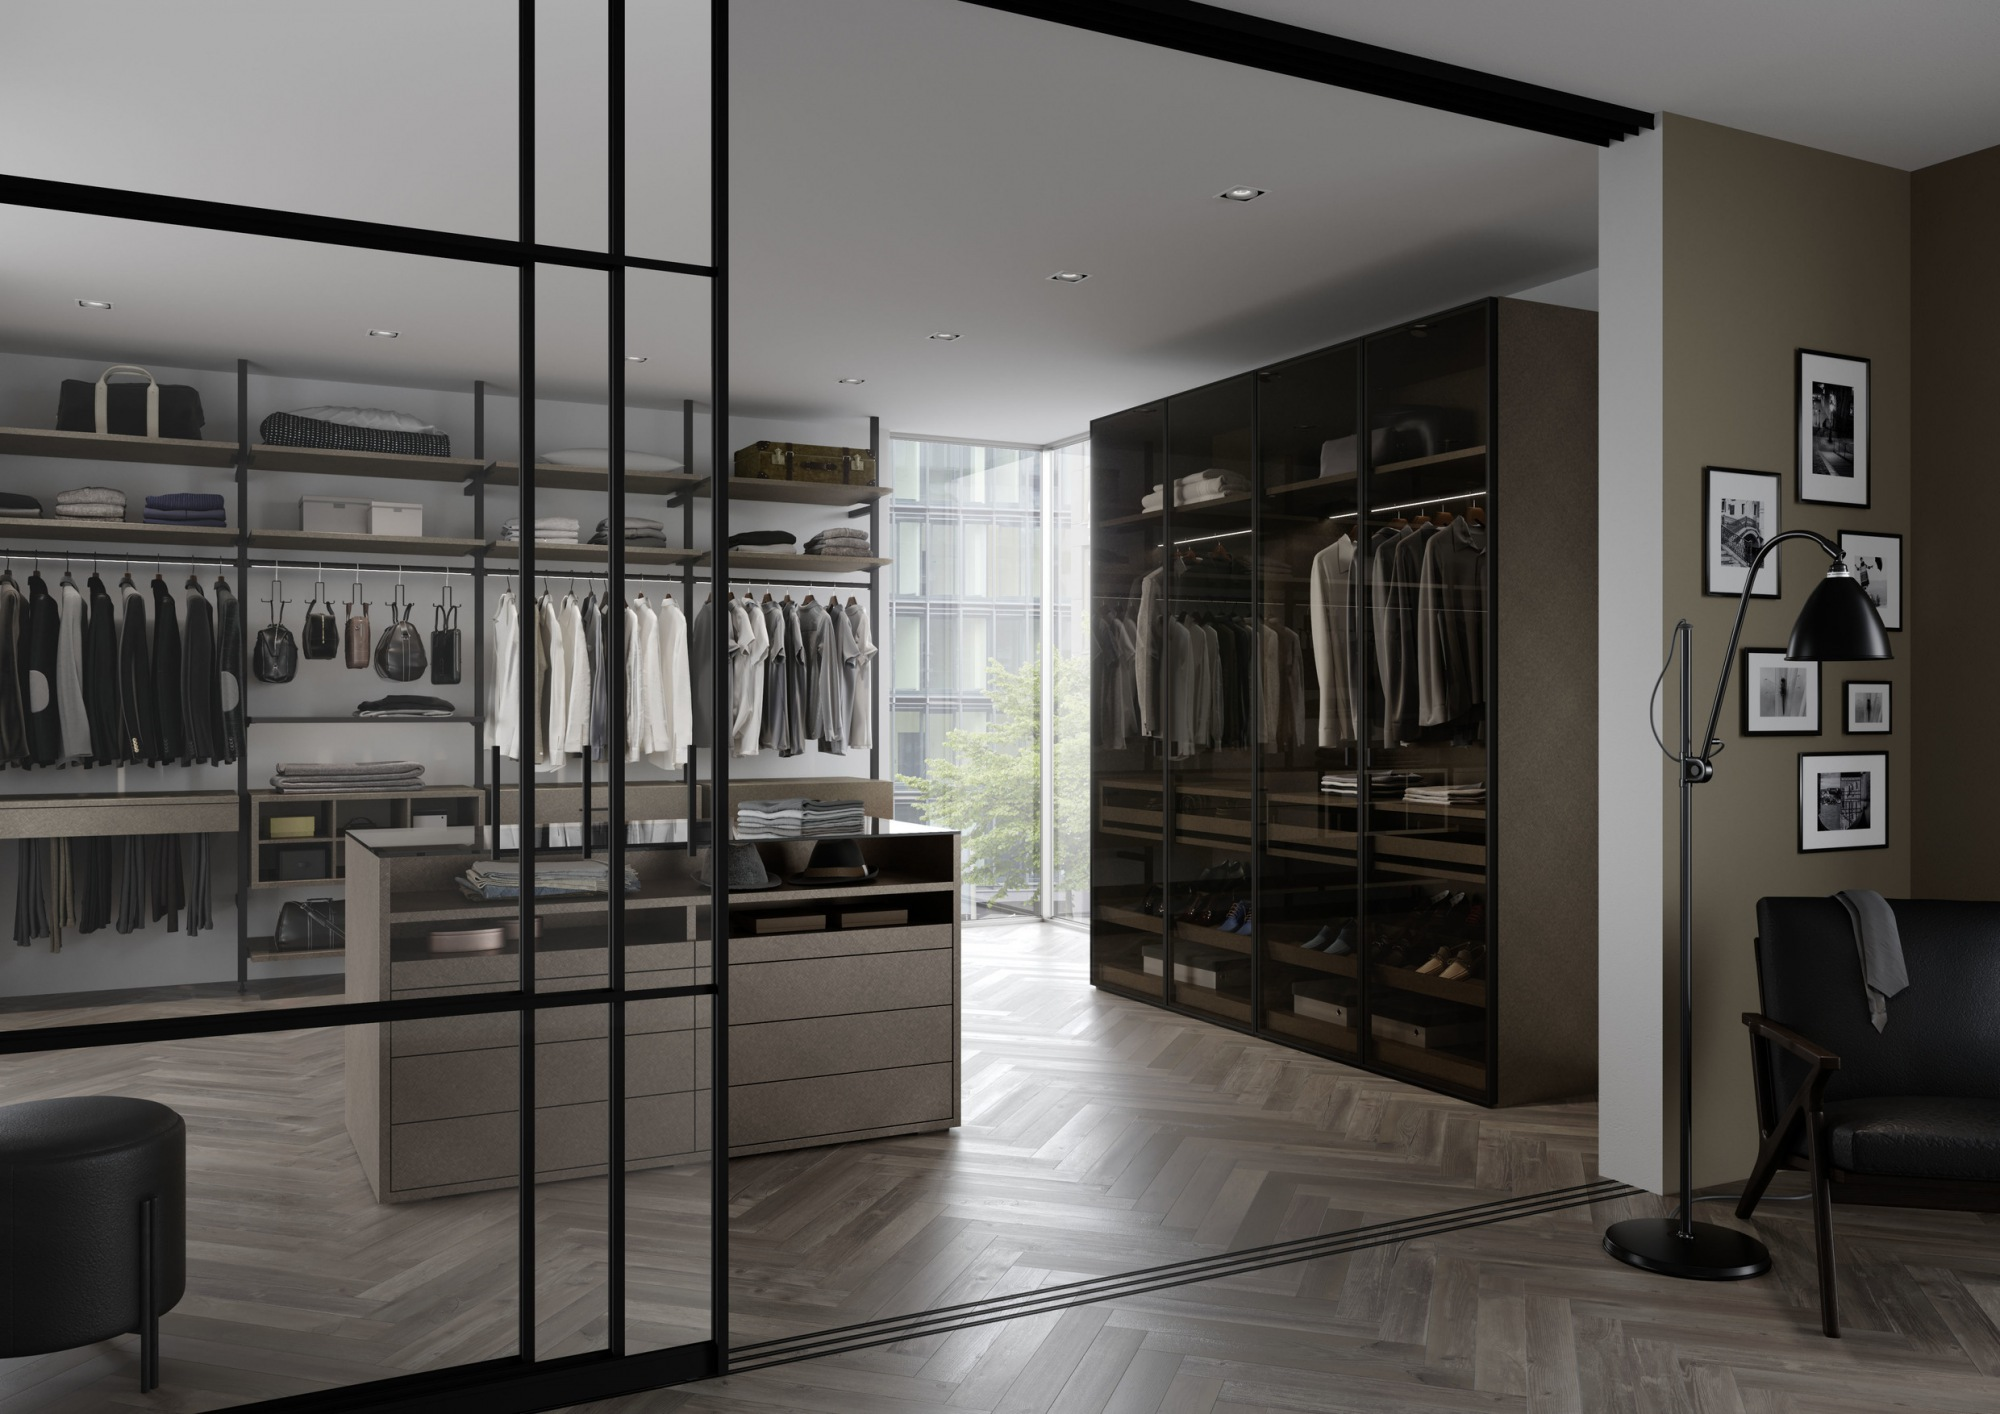 raumplus schiebet ren. Black Bedroom Furniture Sets. Home Design Ideas